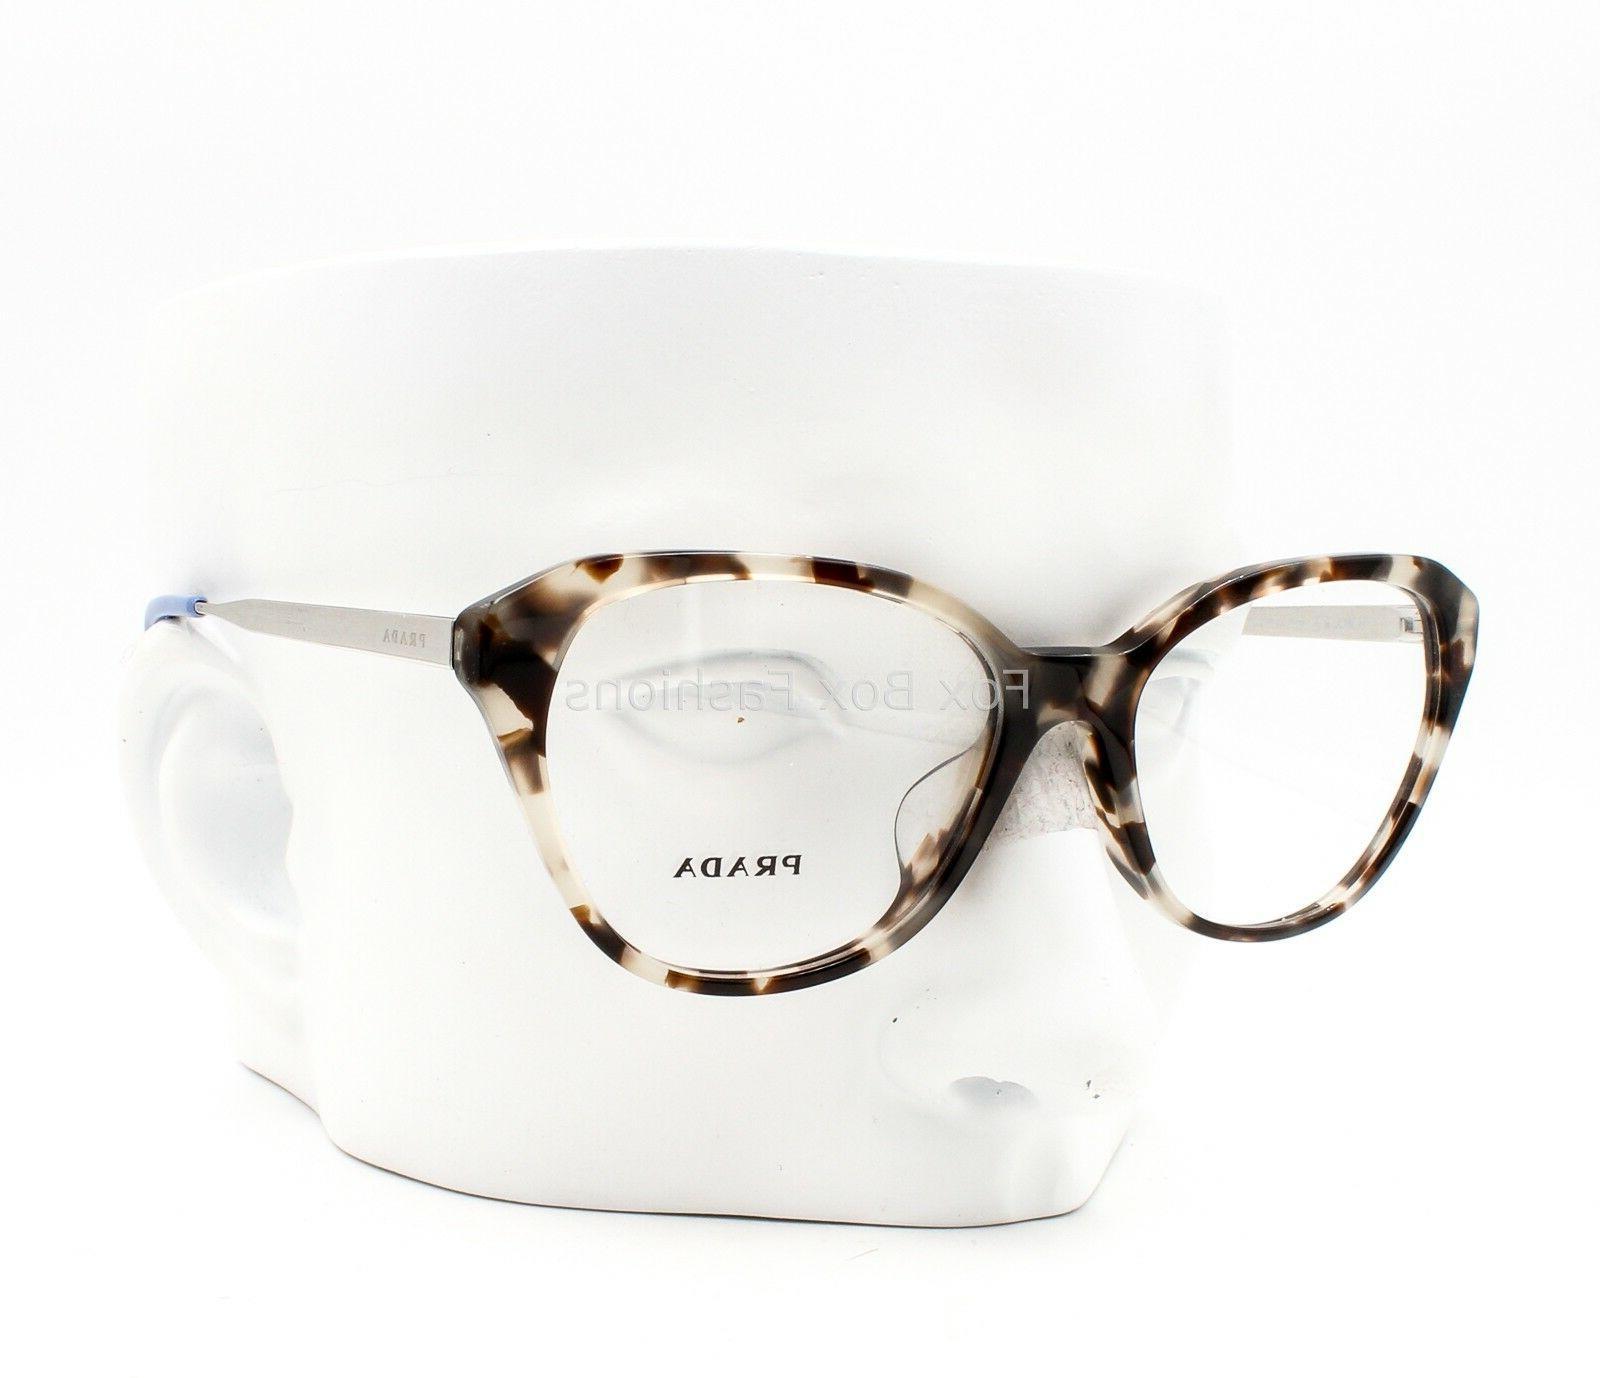 vpr 28s f uao 1o1 eyeglasses glasses